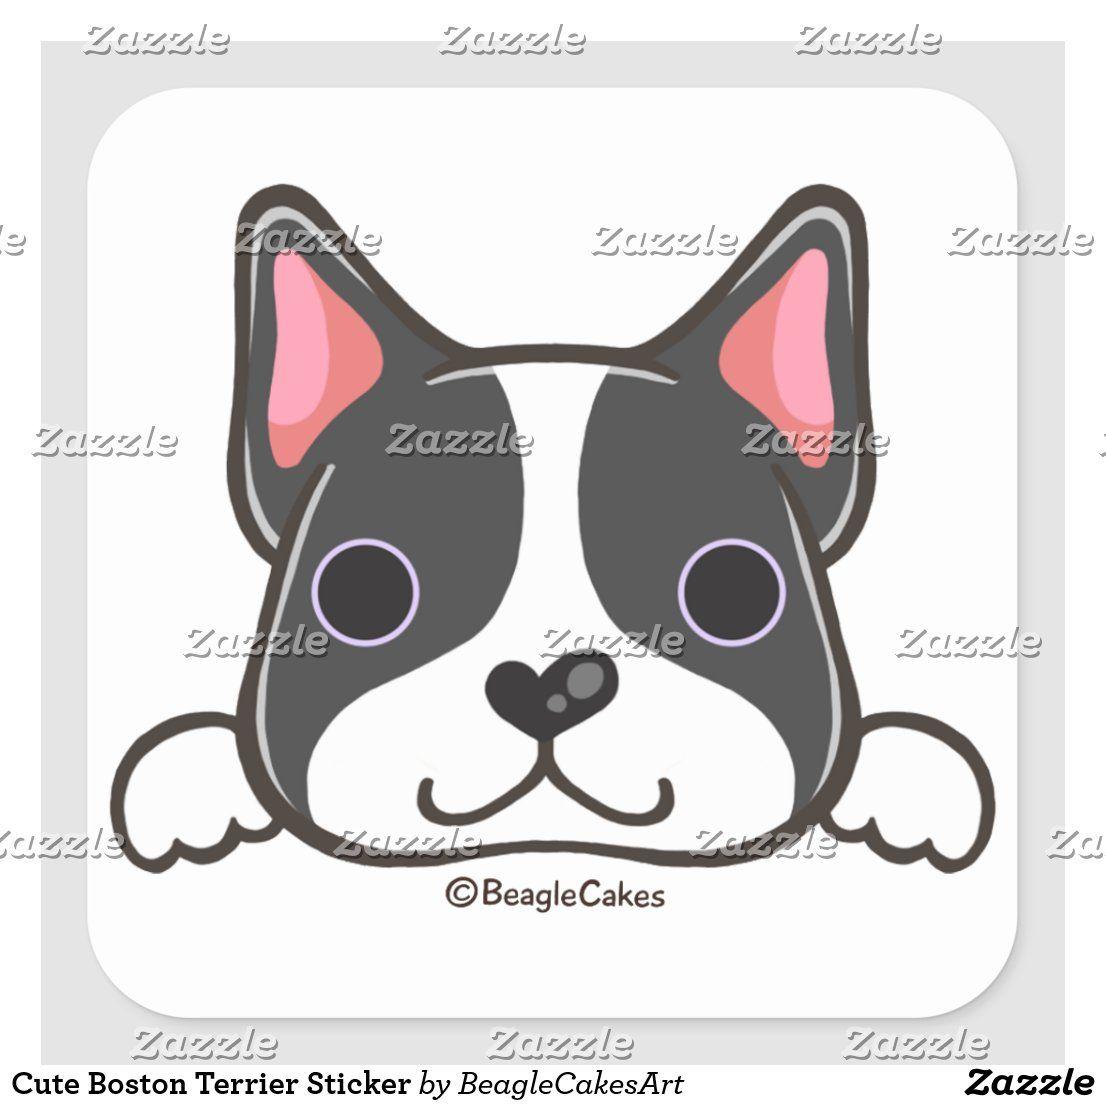 Cute Boston Terrier Sticker Zazzle Com In 2020 Dog Coloring Page Cute Animal Illustration Boston Terrier Illustration